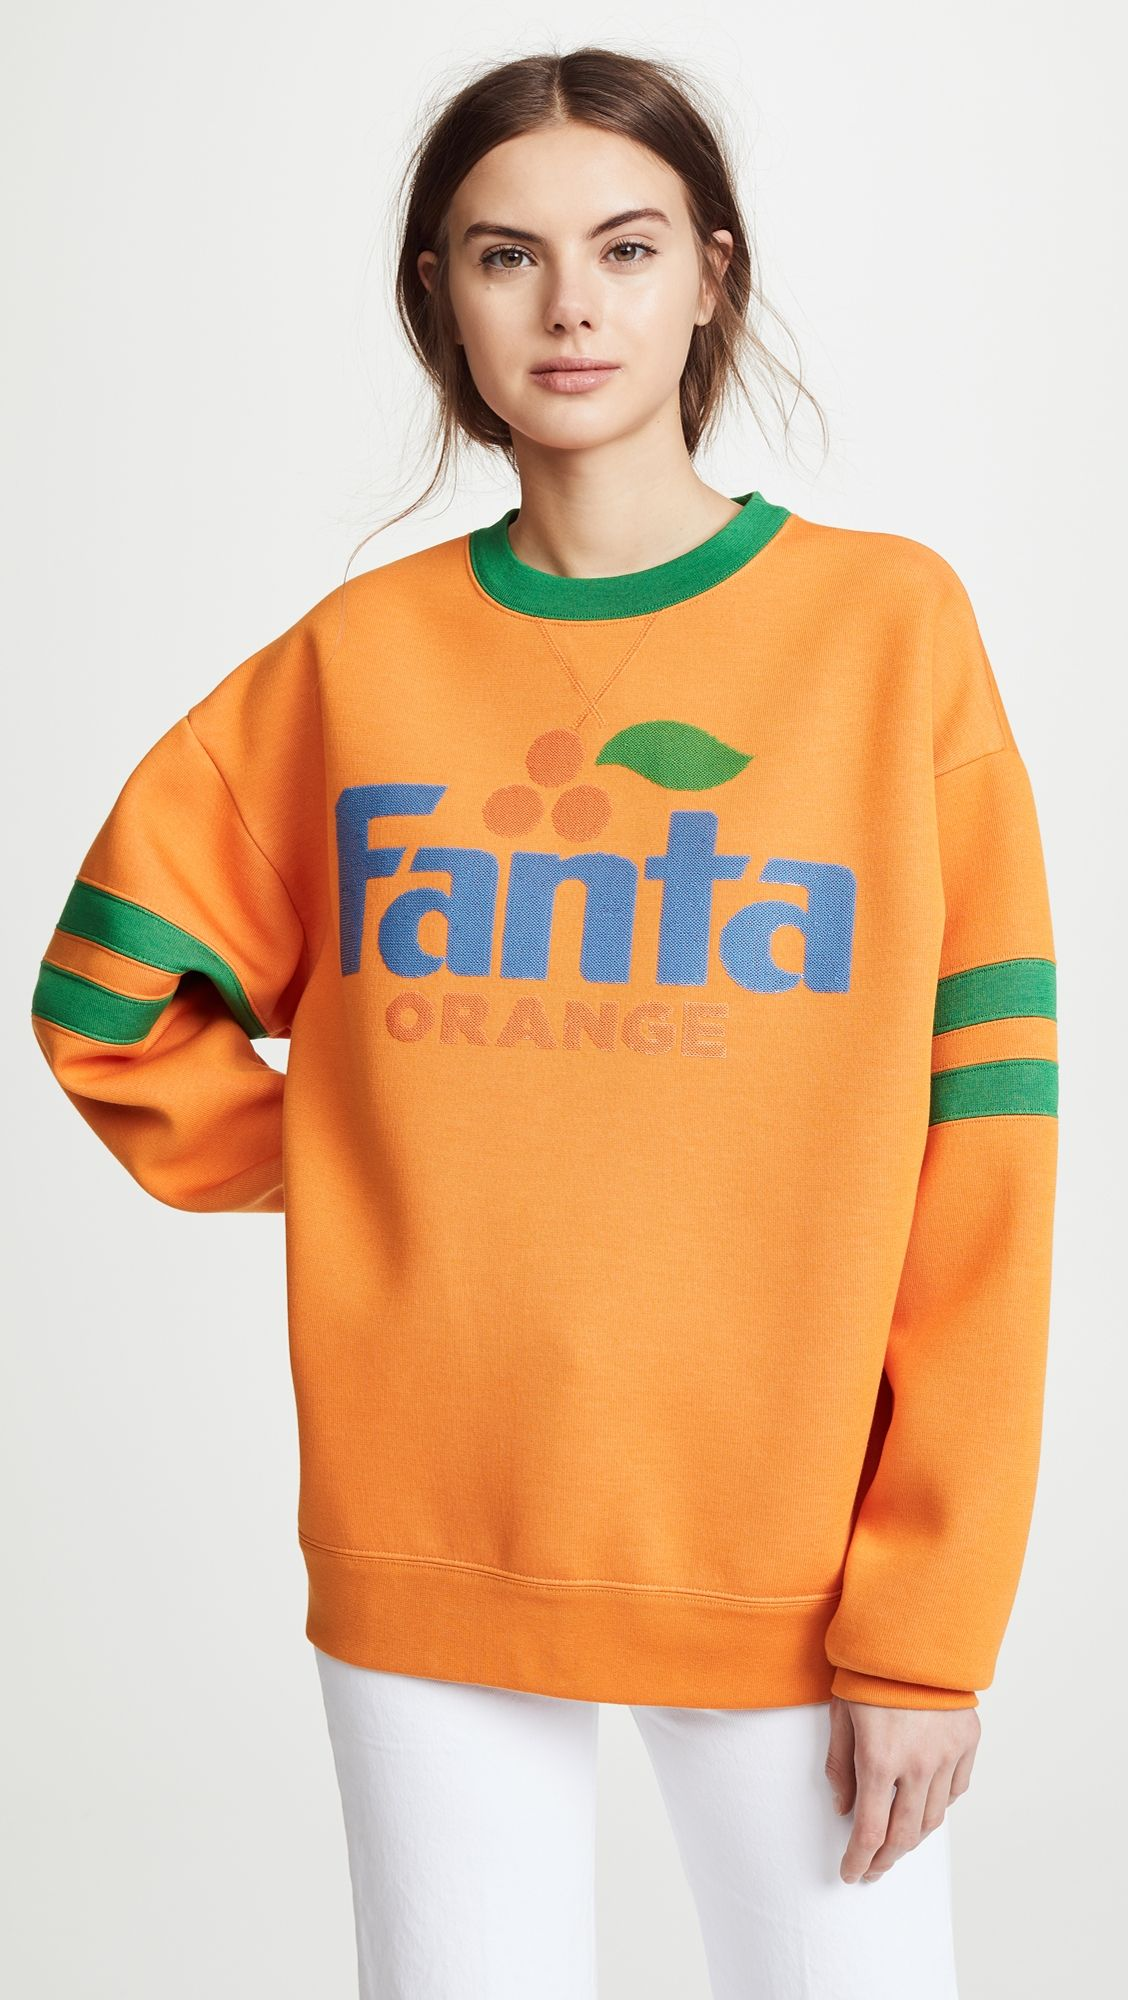 Marc Jacobs Fanta Sweatshirt With Long Sleeves Crew Neckline Women Hoodies Sweatshirts Sweatshirts Sweatshirts Women [ 2000 x 1128 Pixel ]